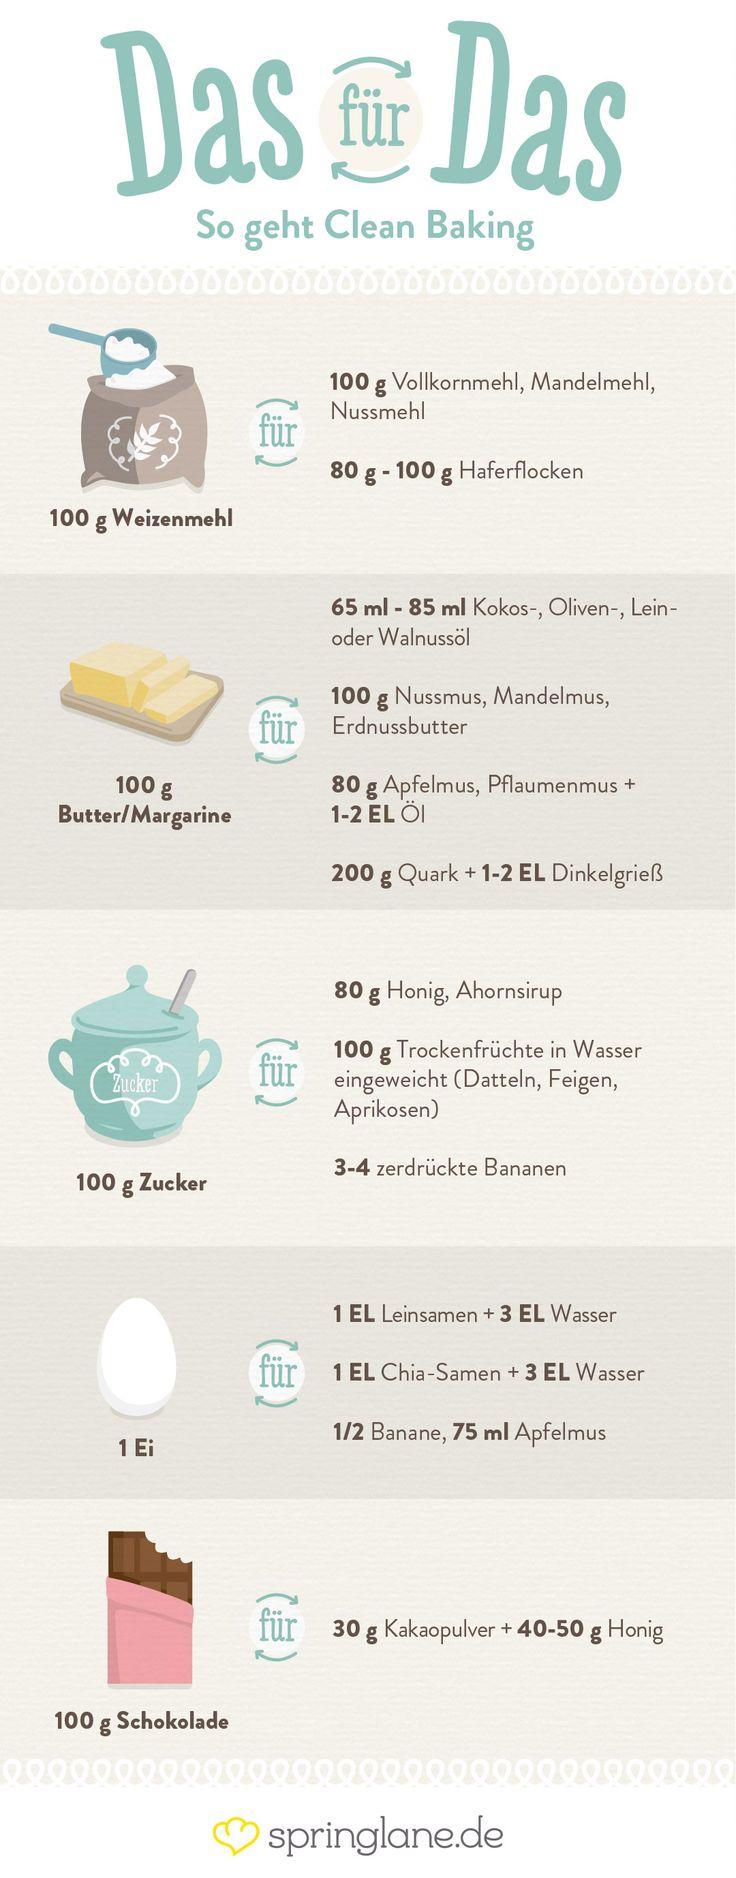 Clean Baking Basics: Alles, was du wissen musst! – Andrea Oswald